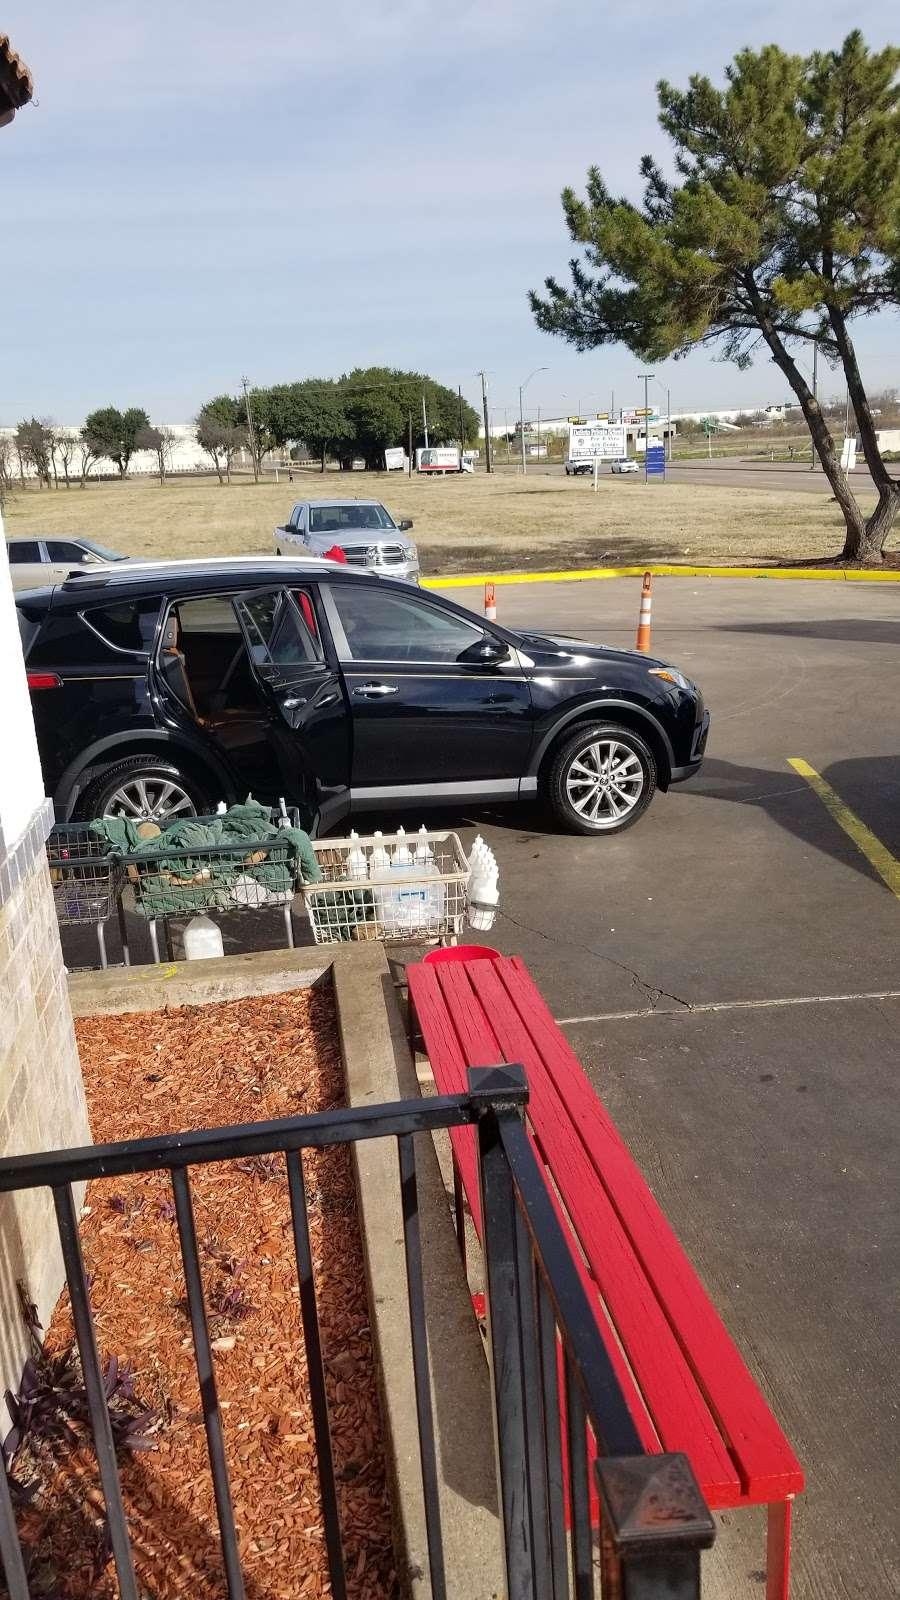 Star Car Wash - car wash    Photo 9 of 10   Address: 2111 N Hampton Rd, DeSoto, TX 75115, USA   Phone: (972) 298-5772